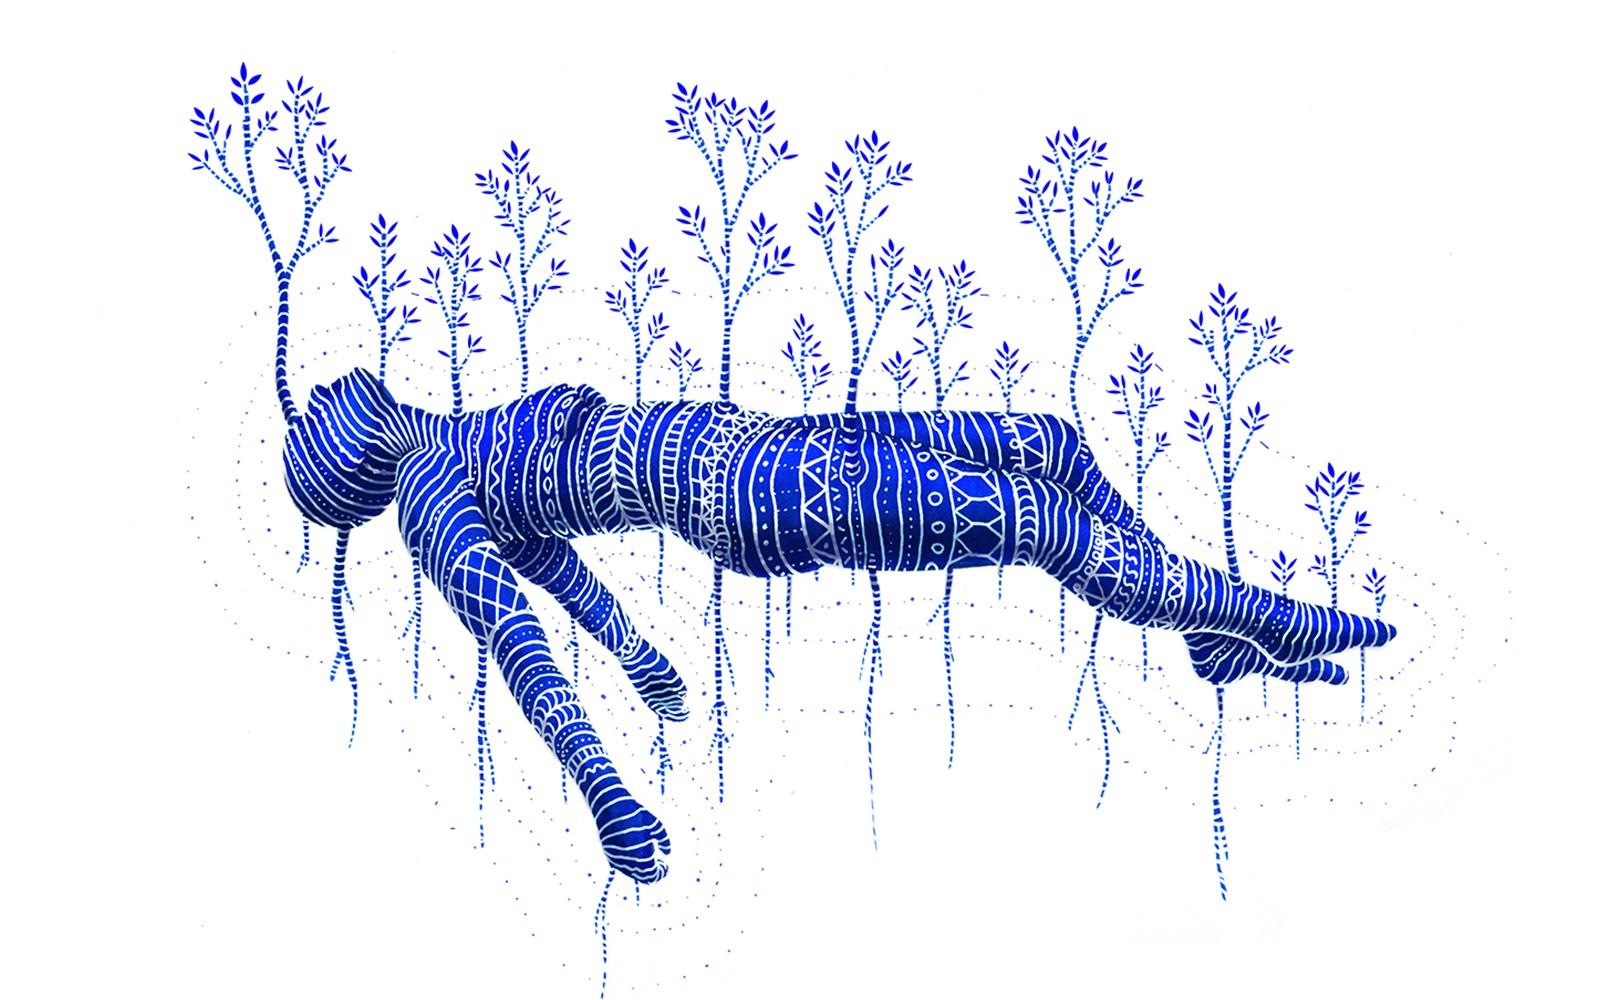 spiritual art_The Art of Consciousness_Sabina Ibiza 2